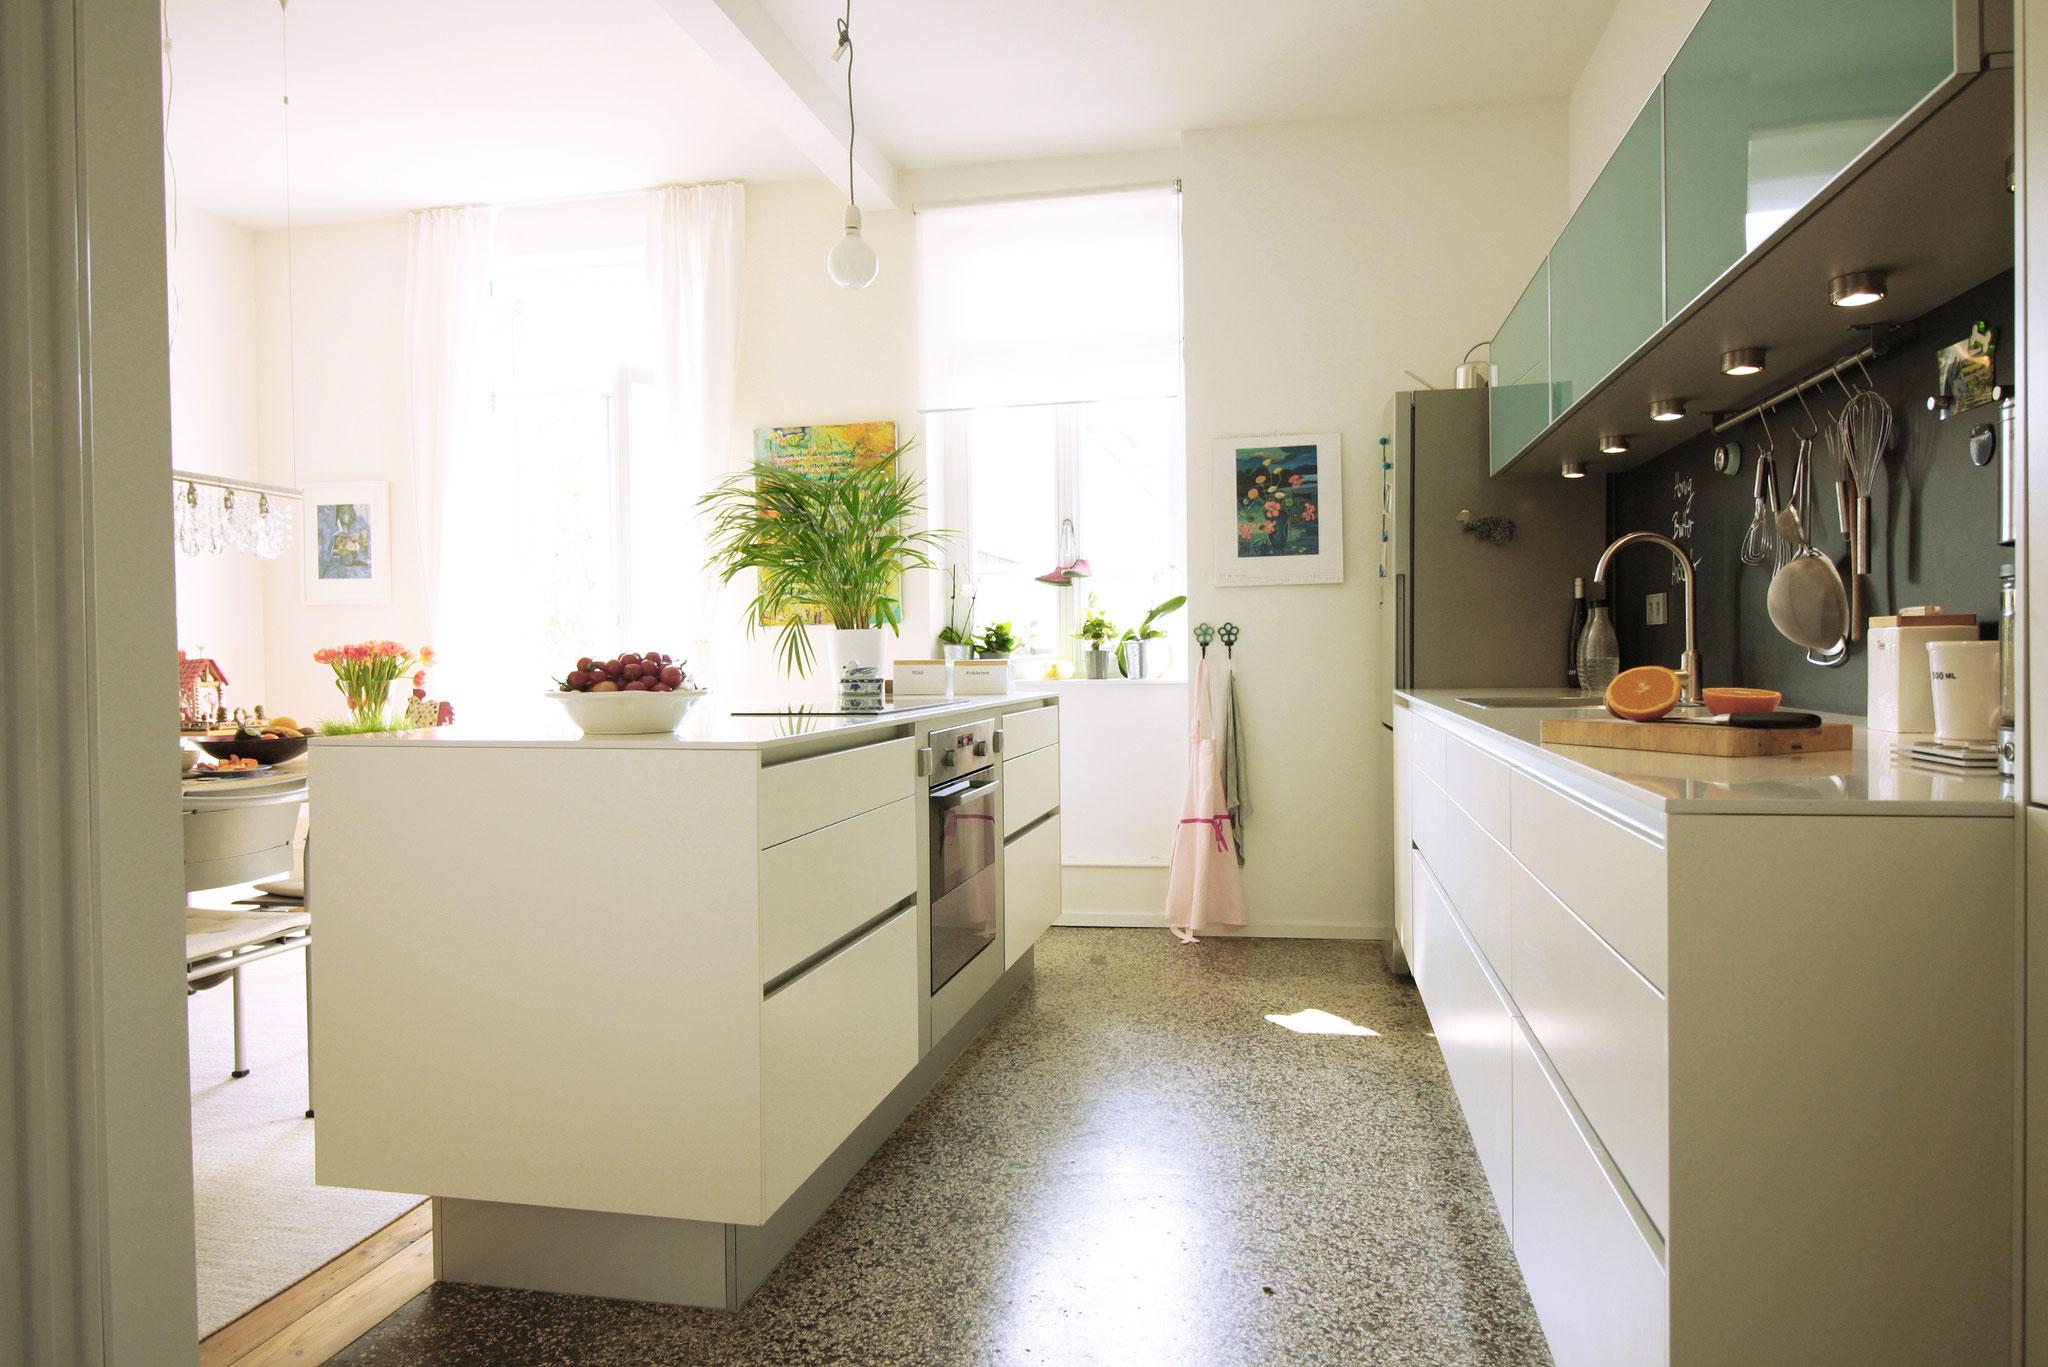 Berühmt Low Budget Küchenschrank Design Fotos - Küchenschrank Ideen ...